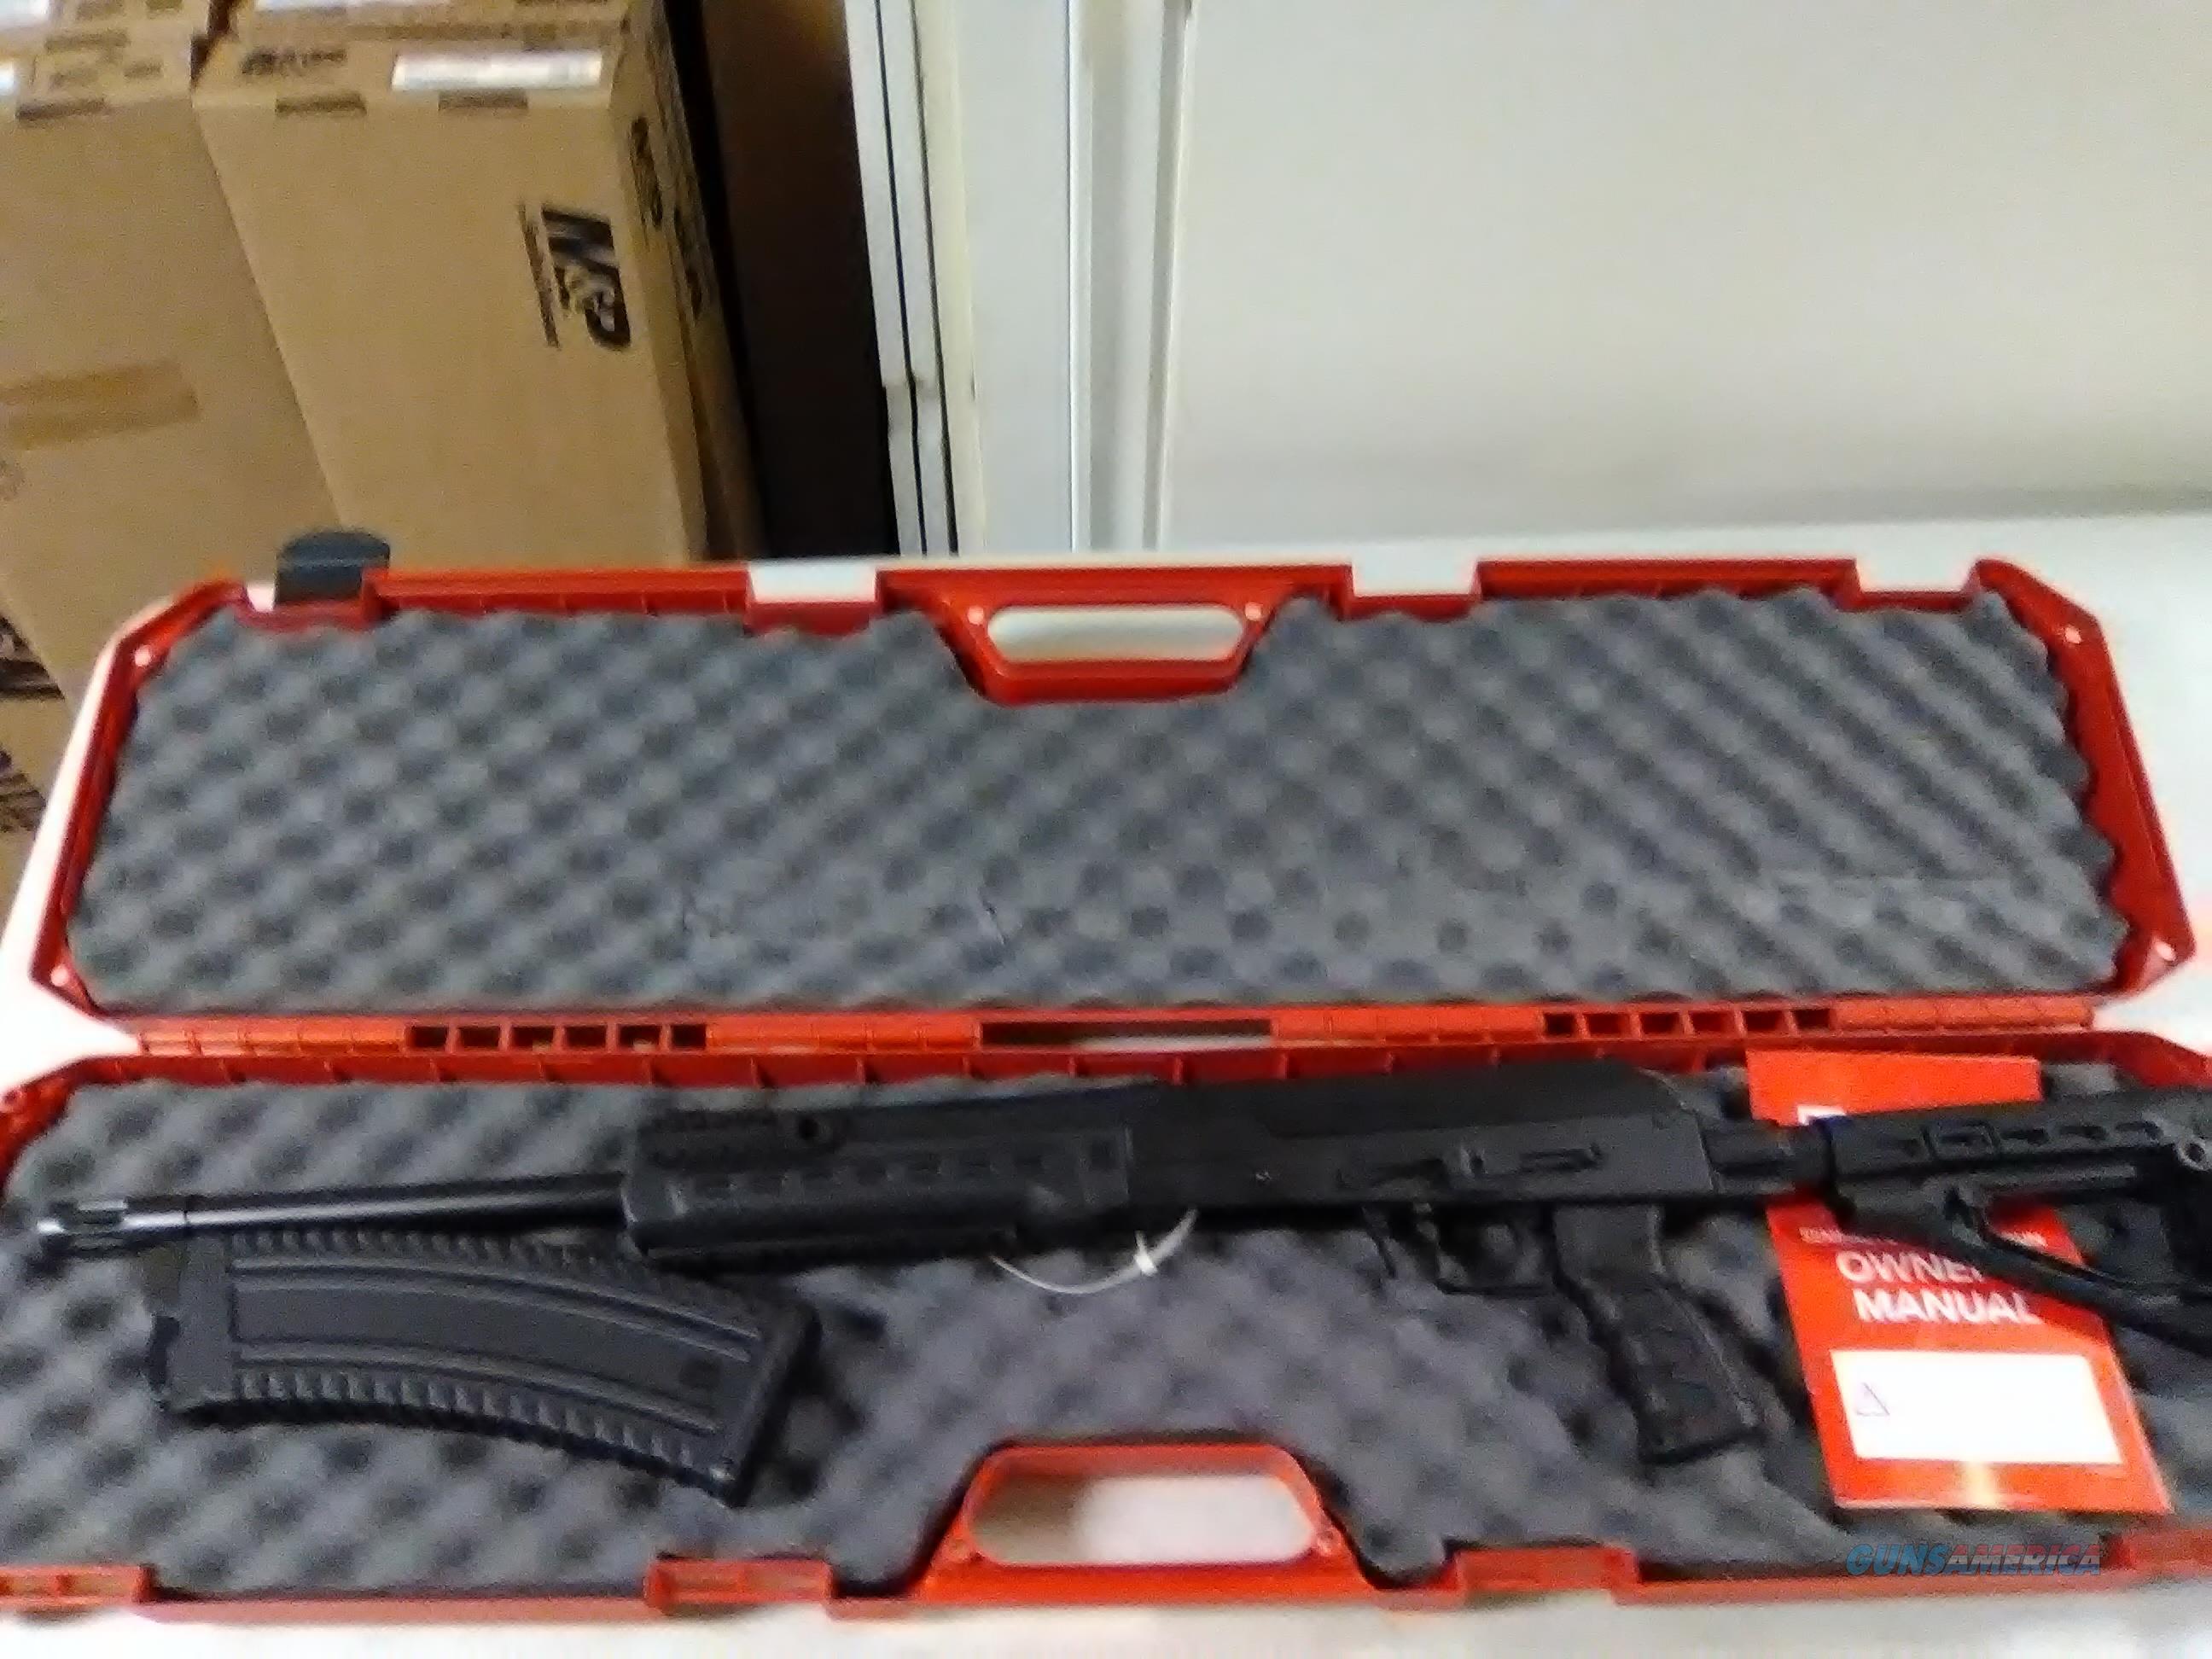 KALASHNIKOV USA KS-12T SHOTGUN  Guns > Shotguns > Kalashnikov USA Shotguns